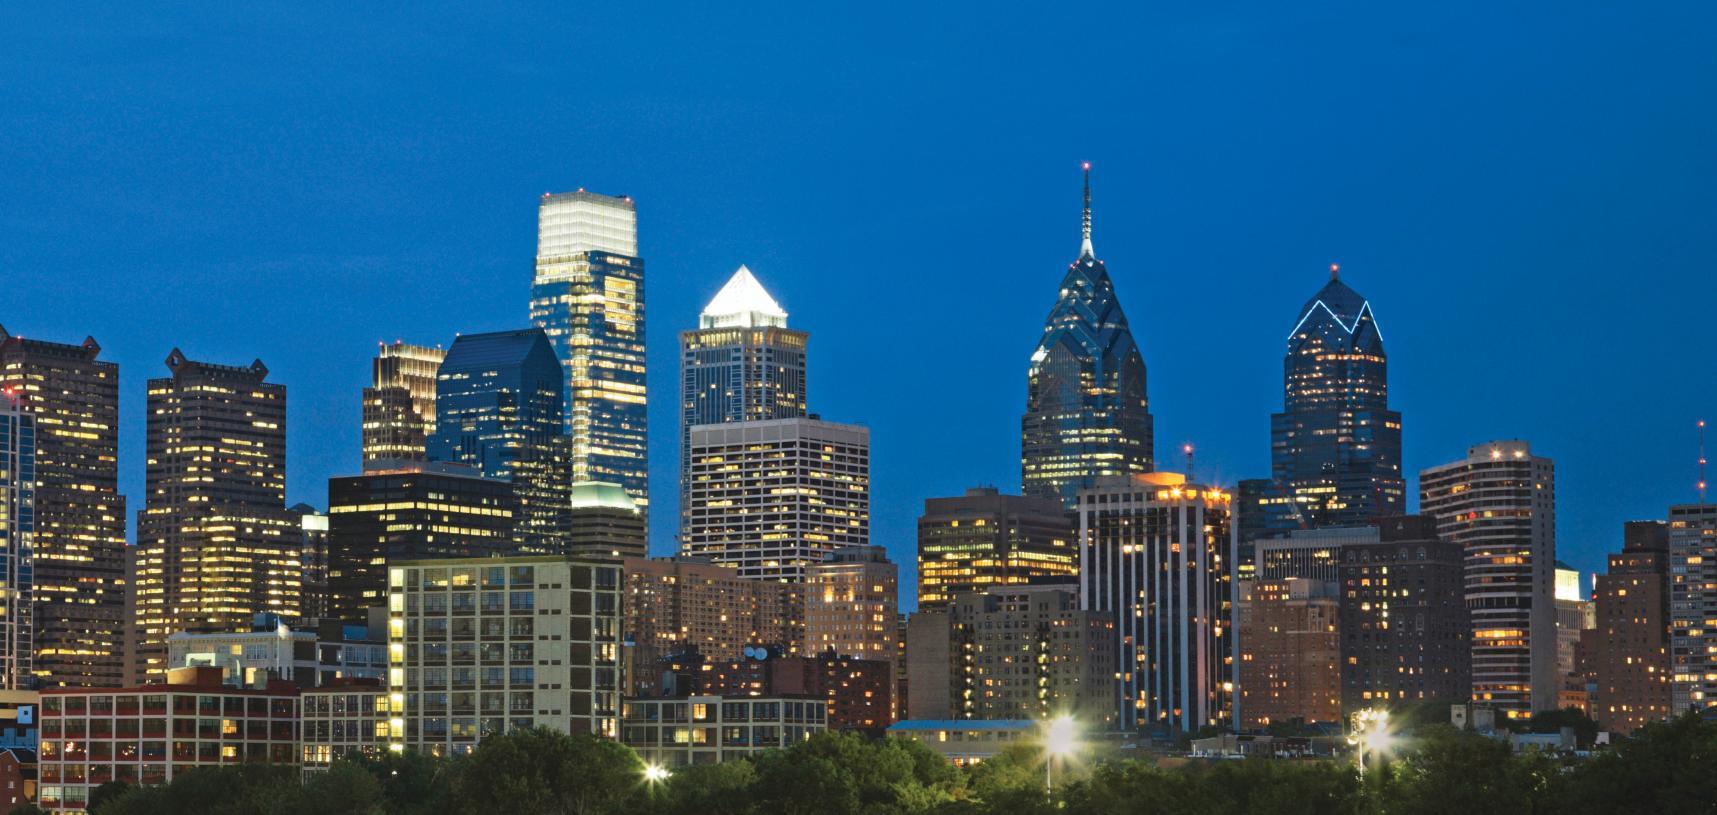 Minutes from Center City Philadelphia